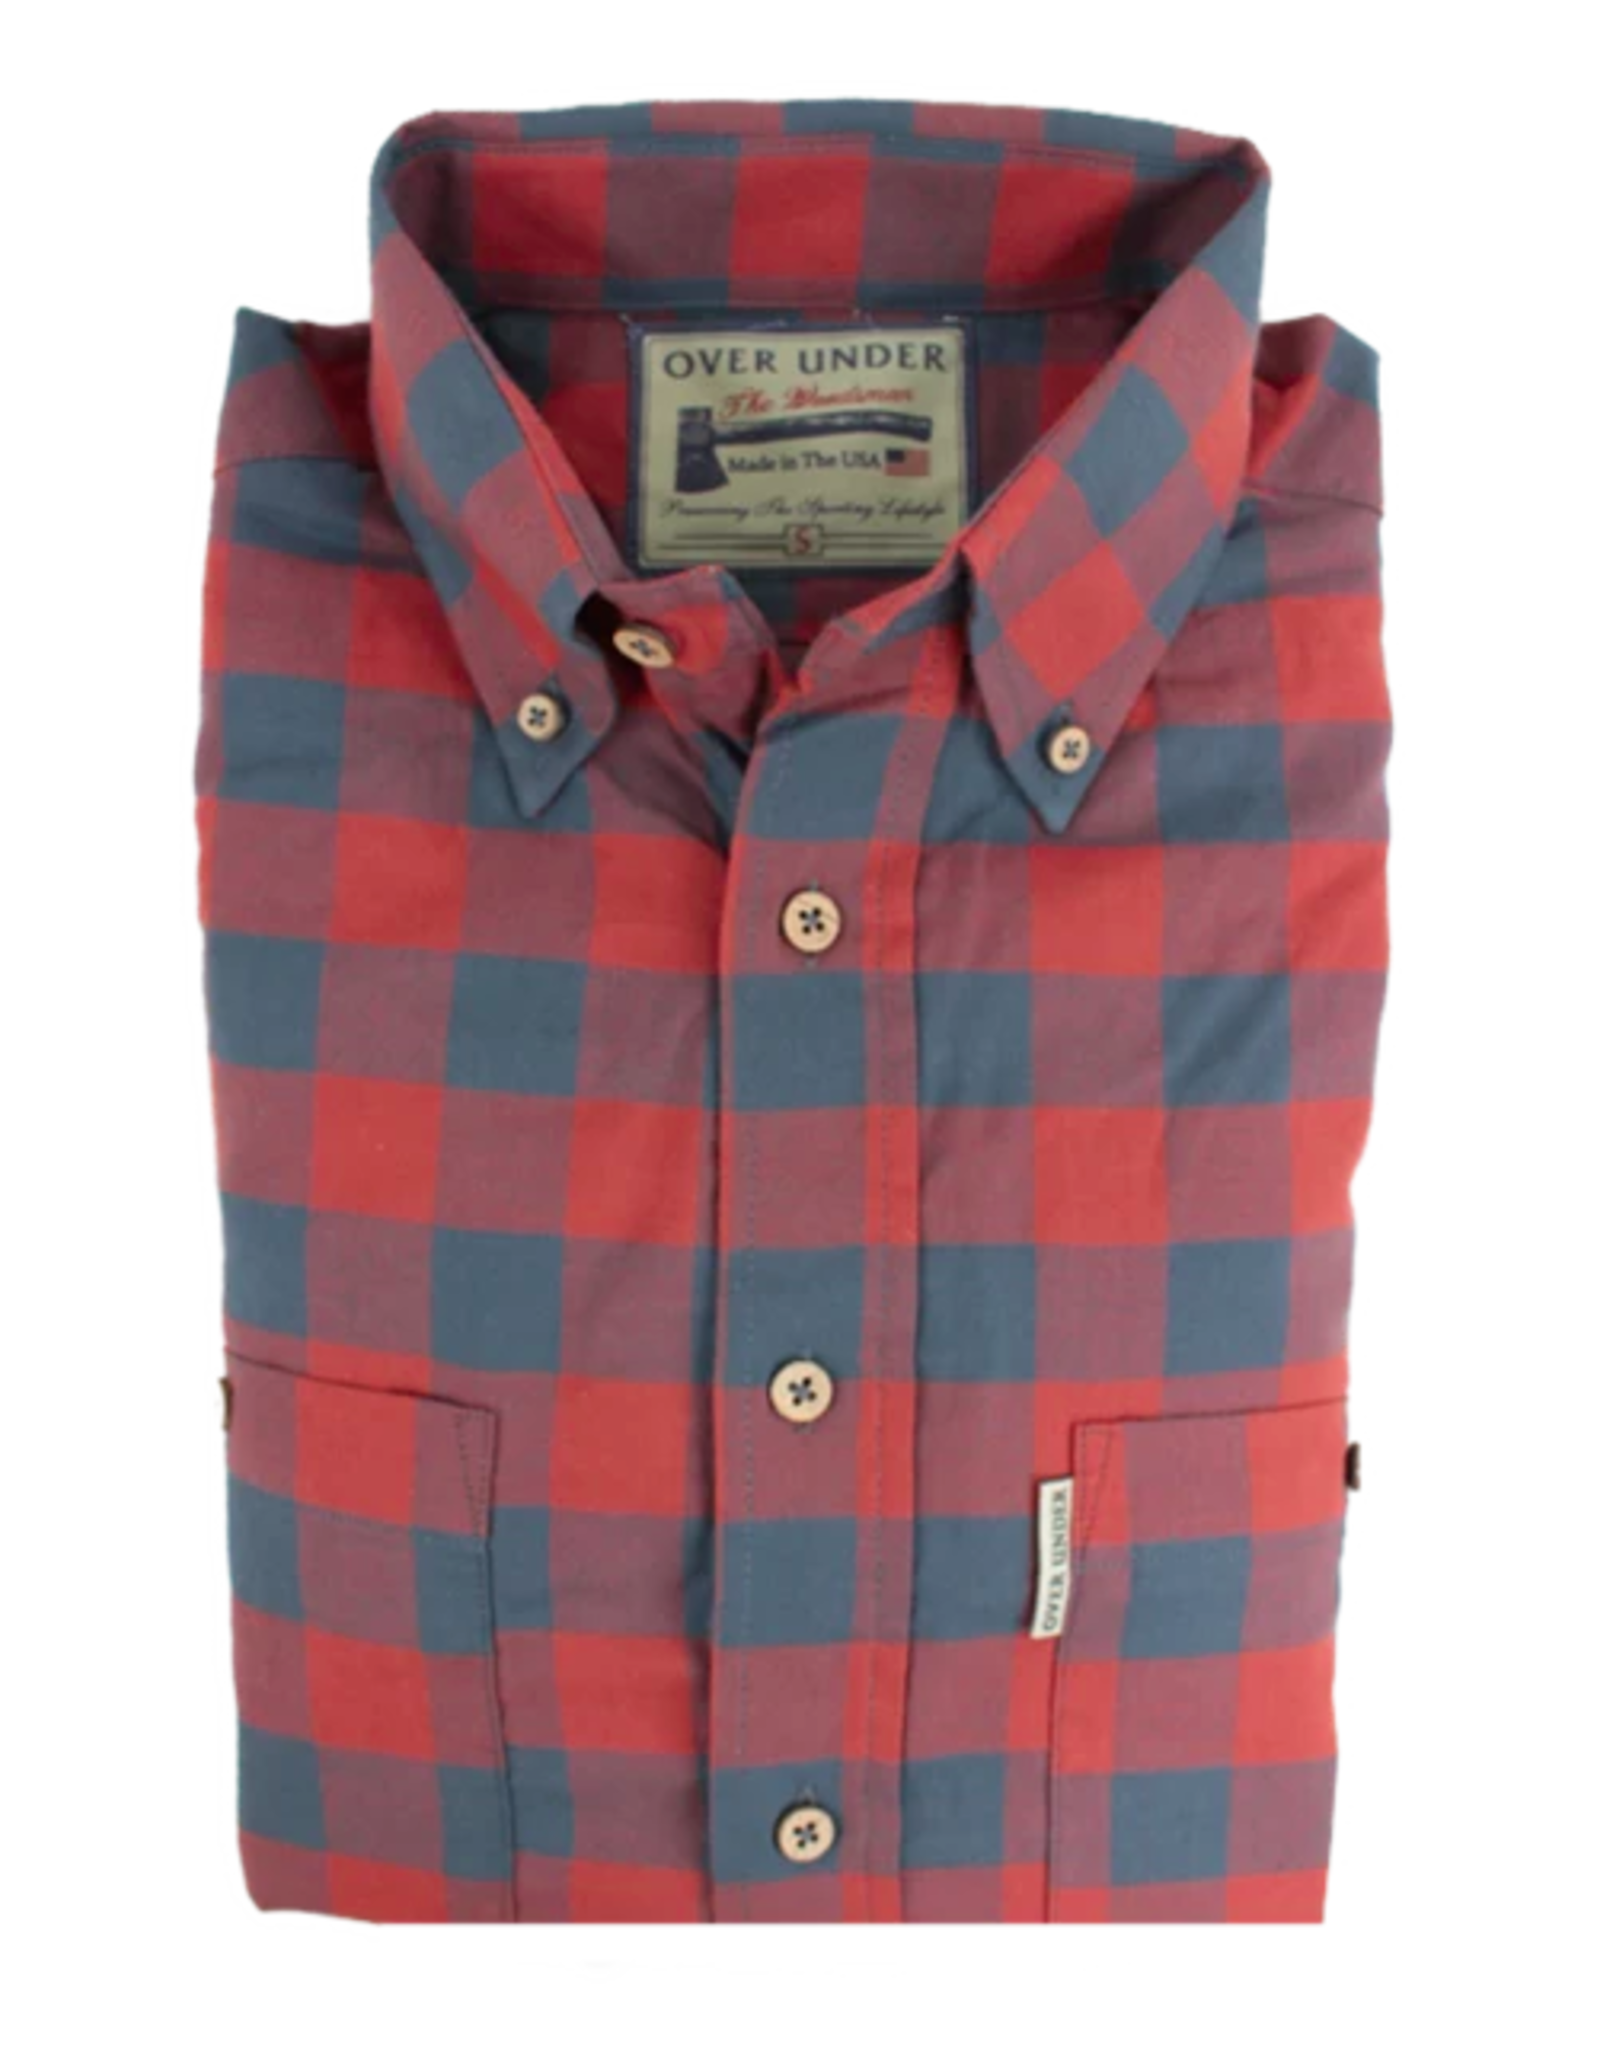 Over Under The Woodsman Flannel Shirt